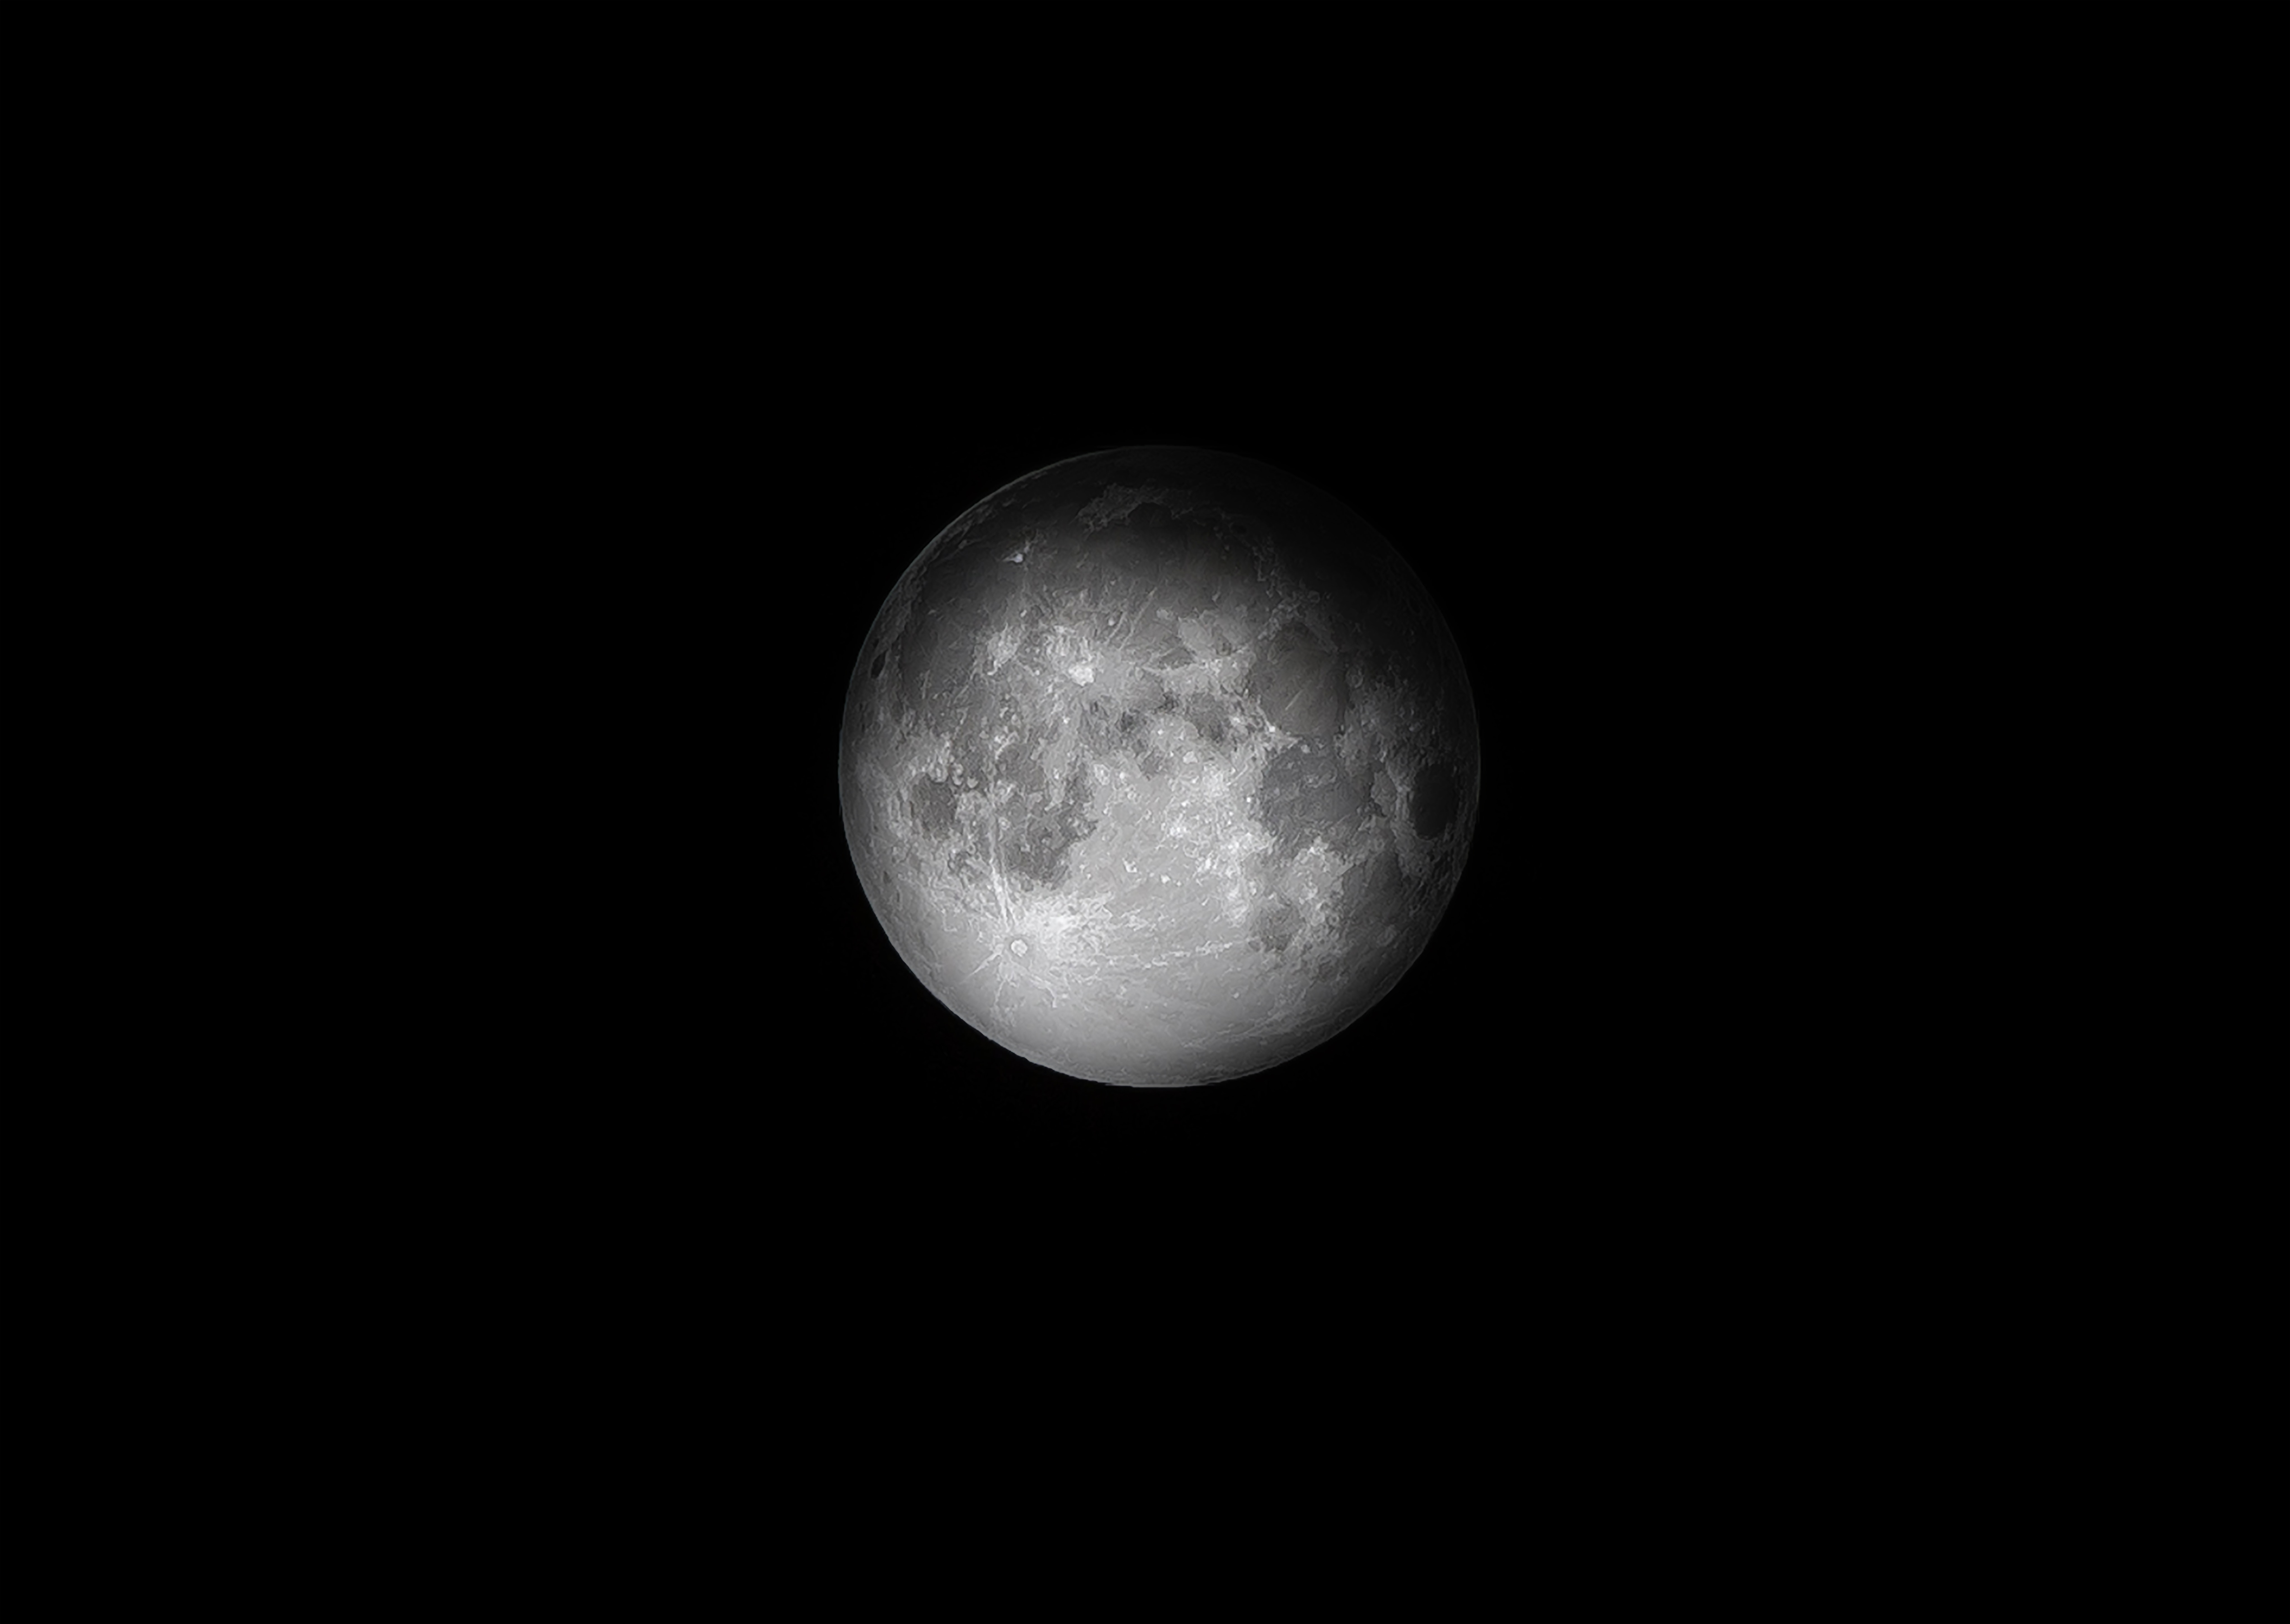 Free stock photo of black-and-white, dark, moon